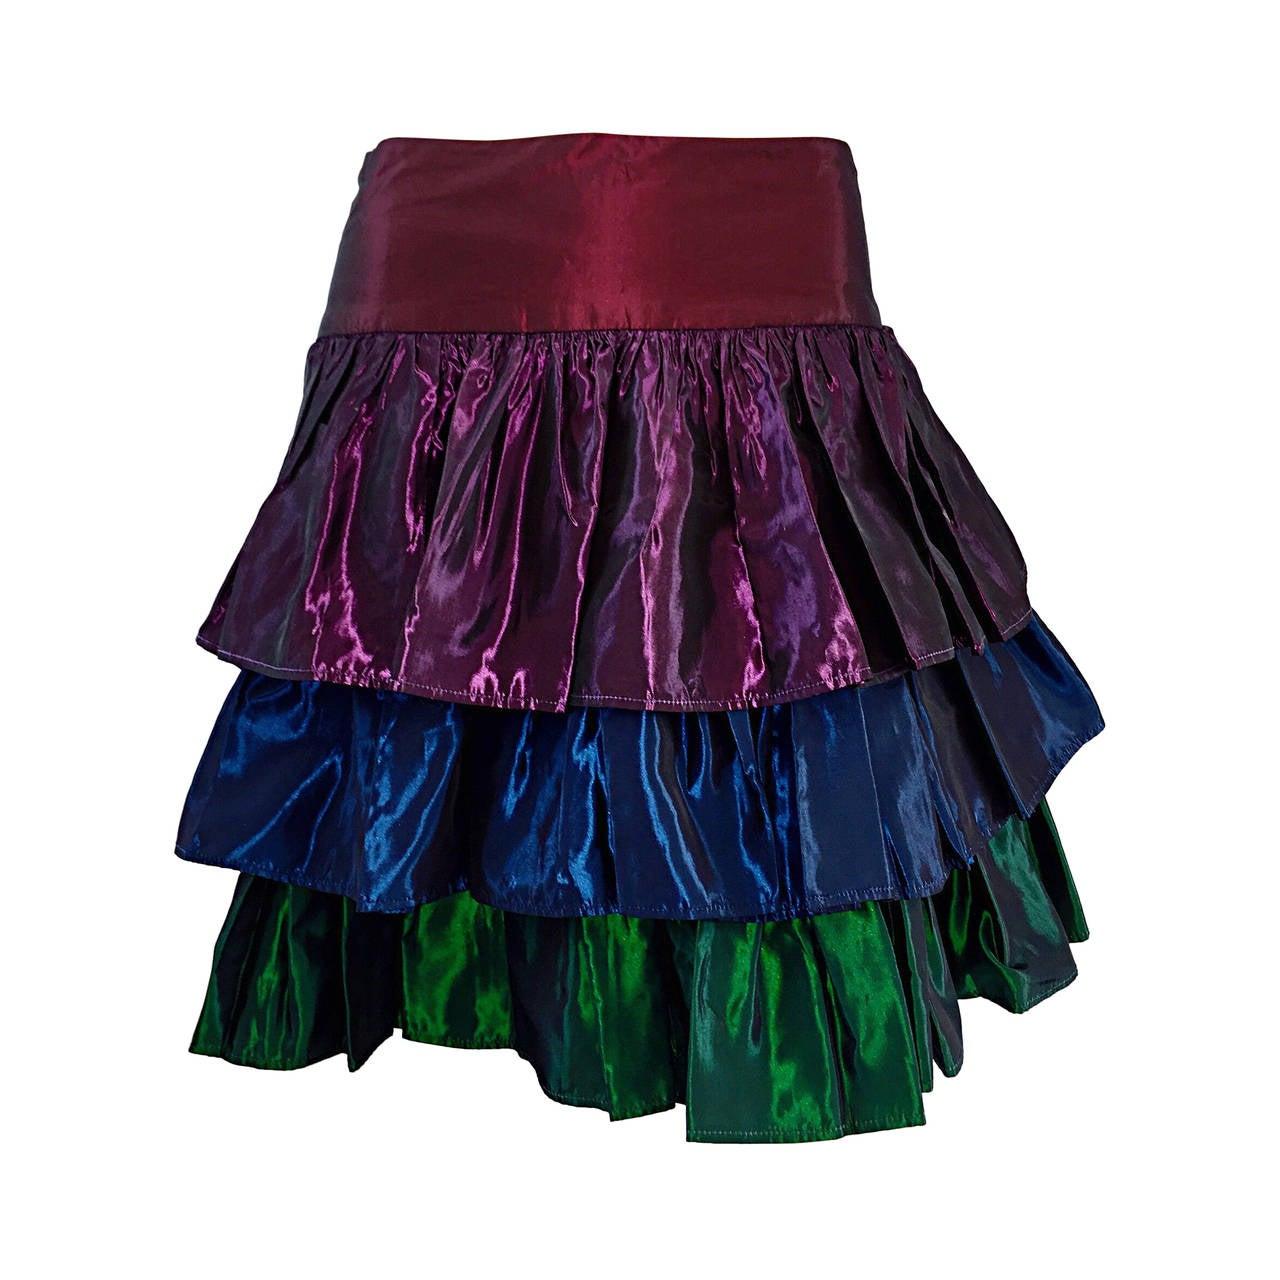 Kalinka For Bergdorf Goodman Tiered Taffeta ' Rainbow ' Vintage Skirt 1